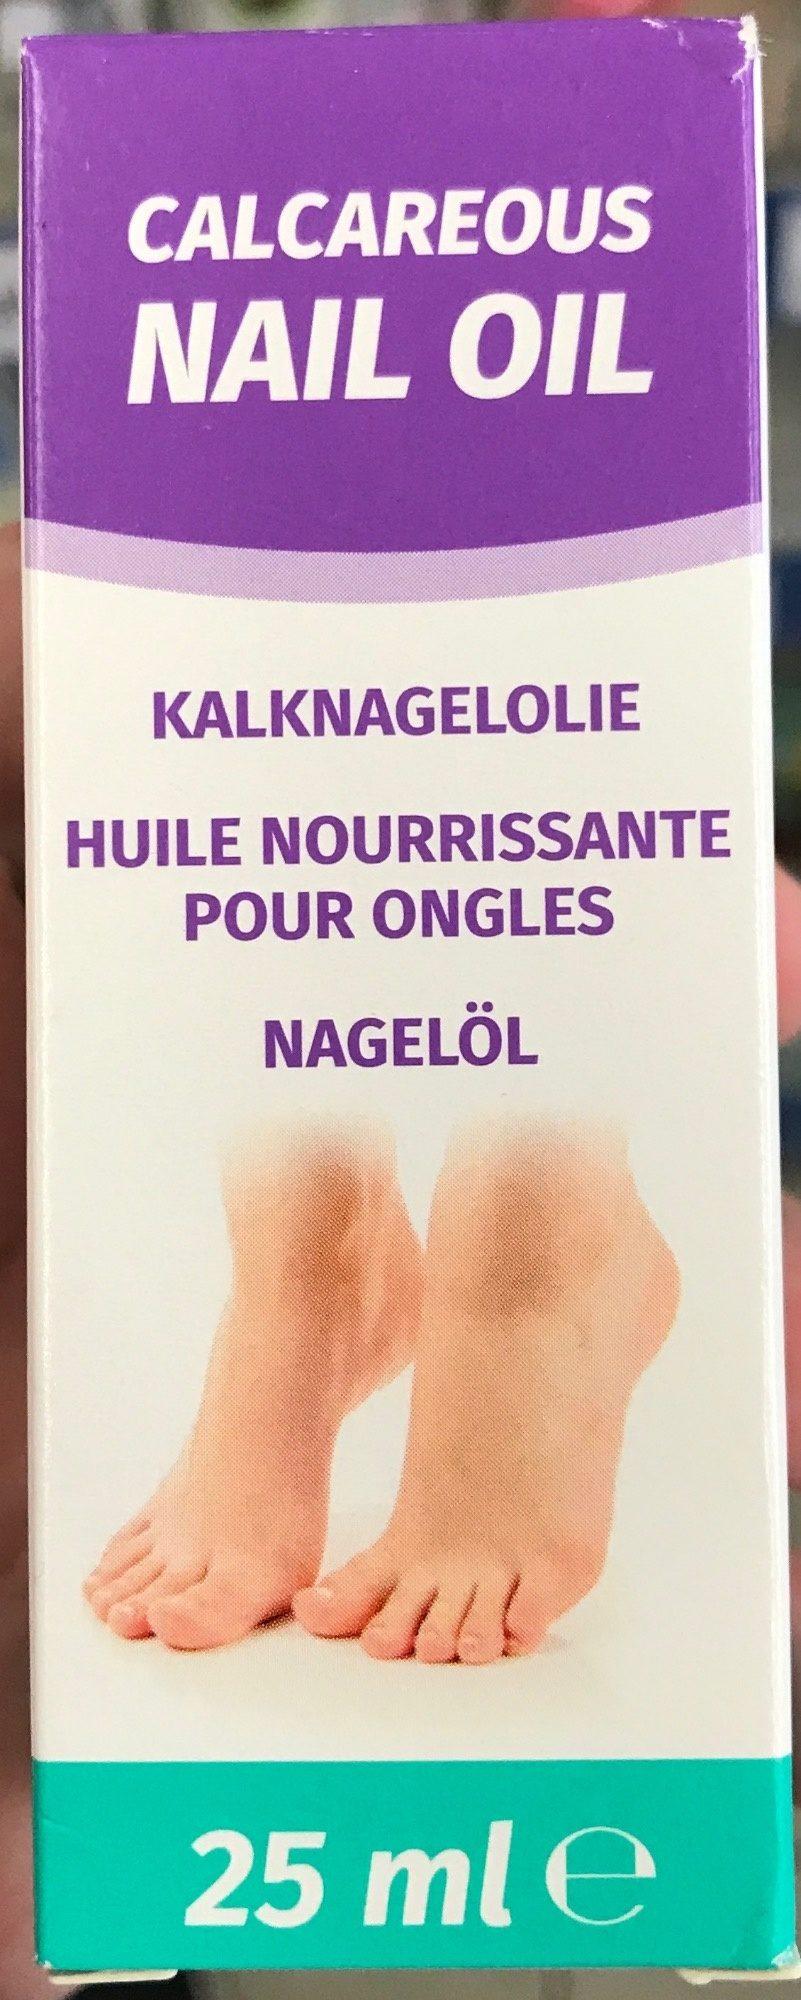 Huile nourrissante pour ongles - Product - fr